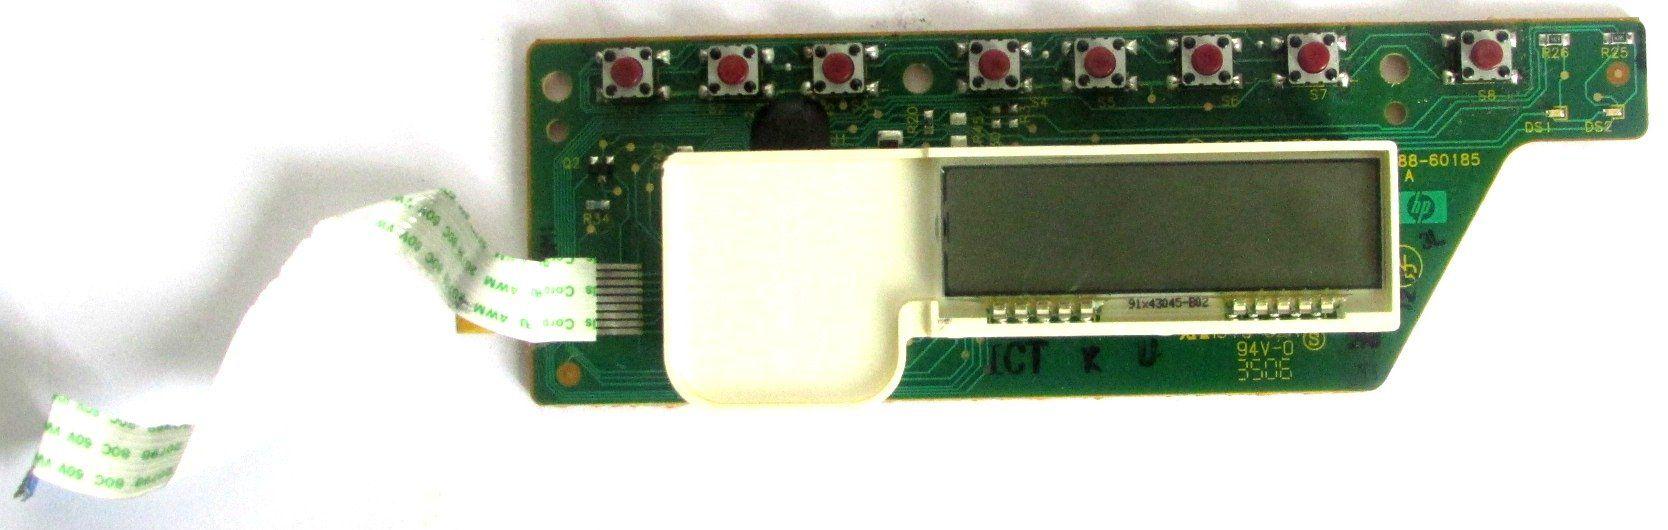 Painel P/ Impressora Hp Photosmart C3180 Multifuncional (semi novo)